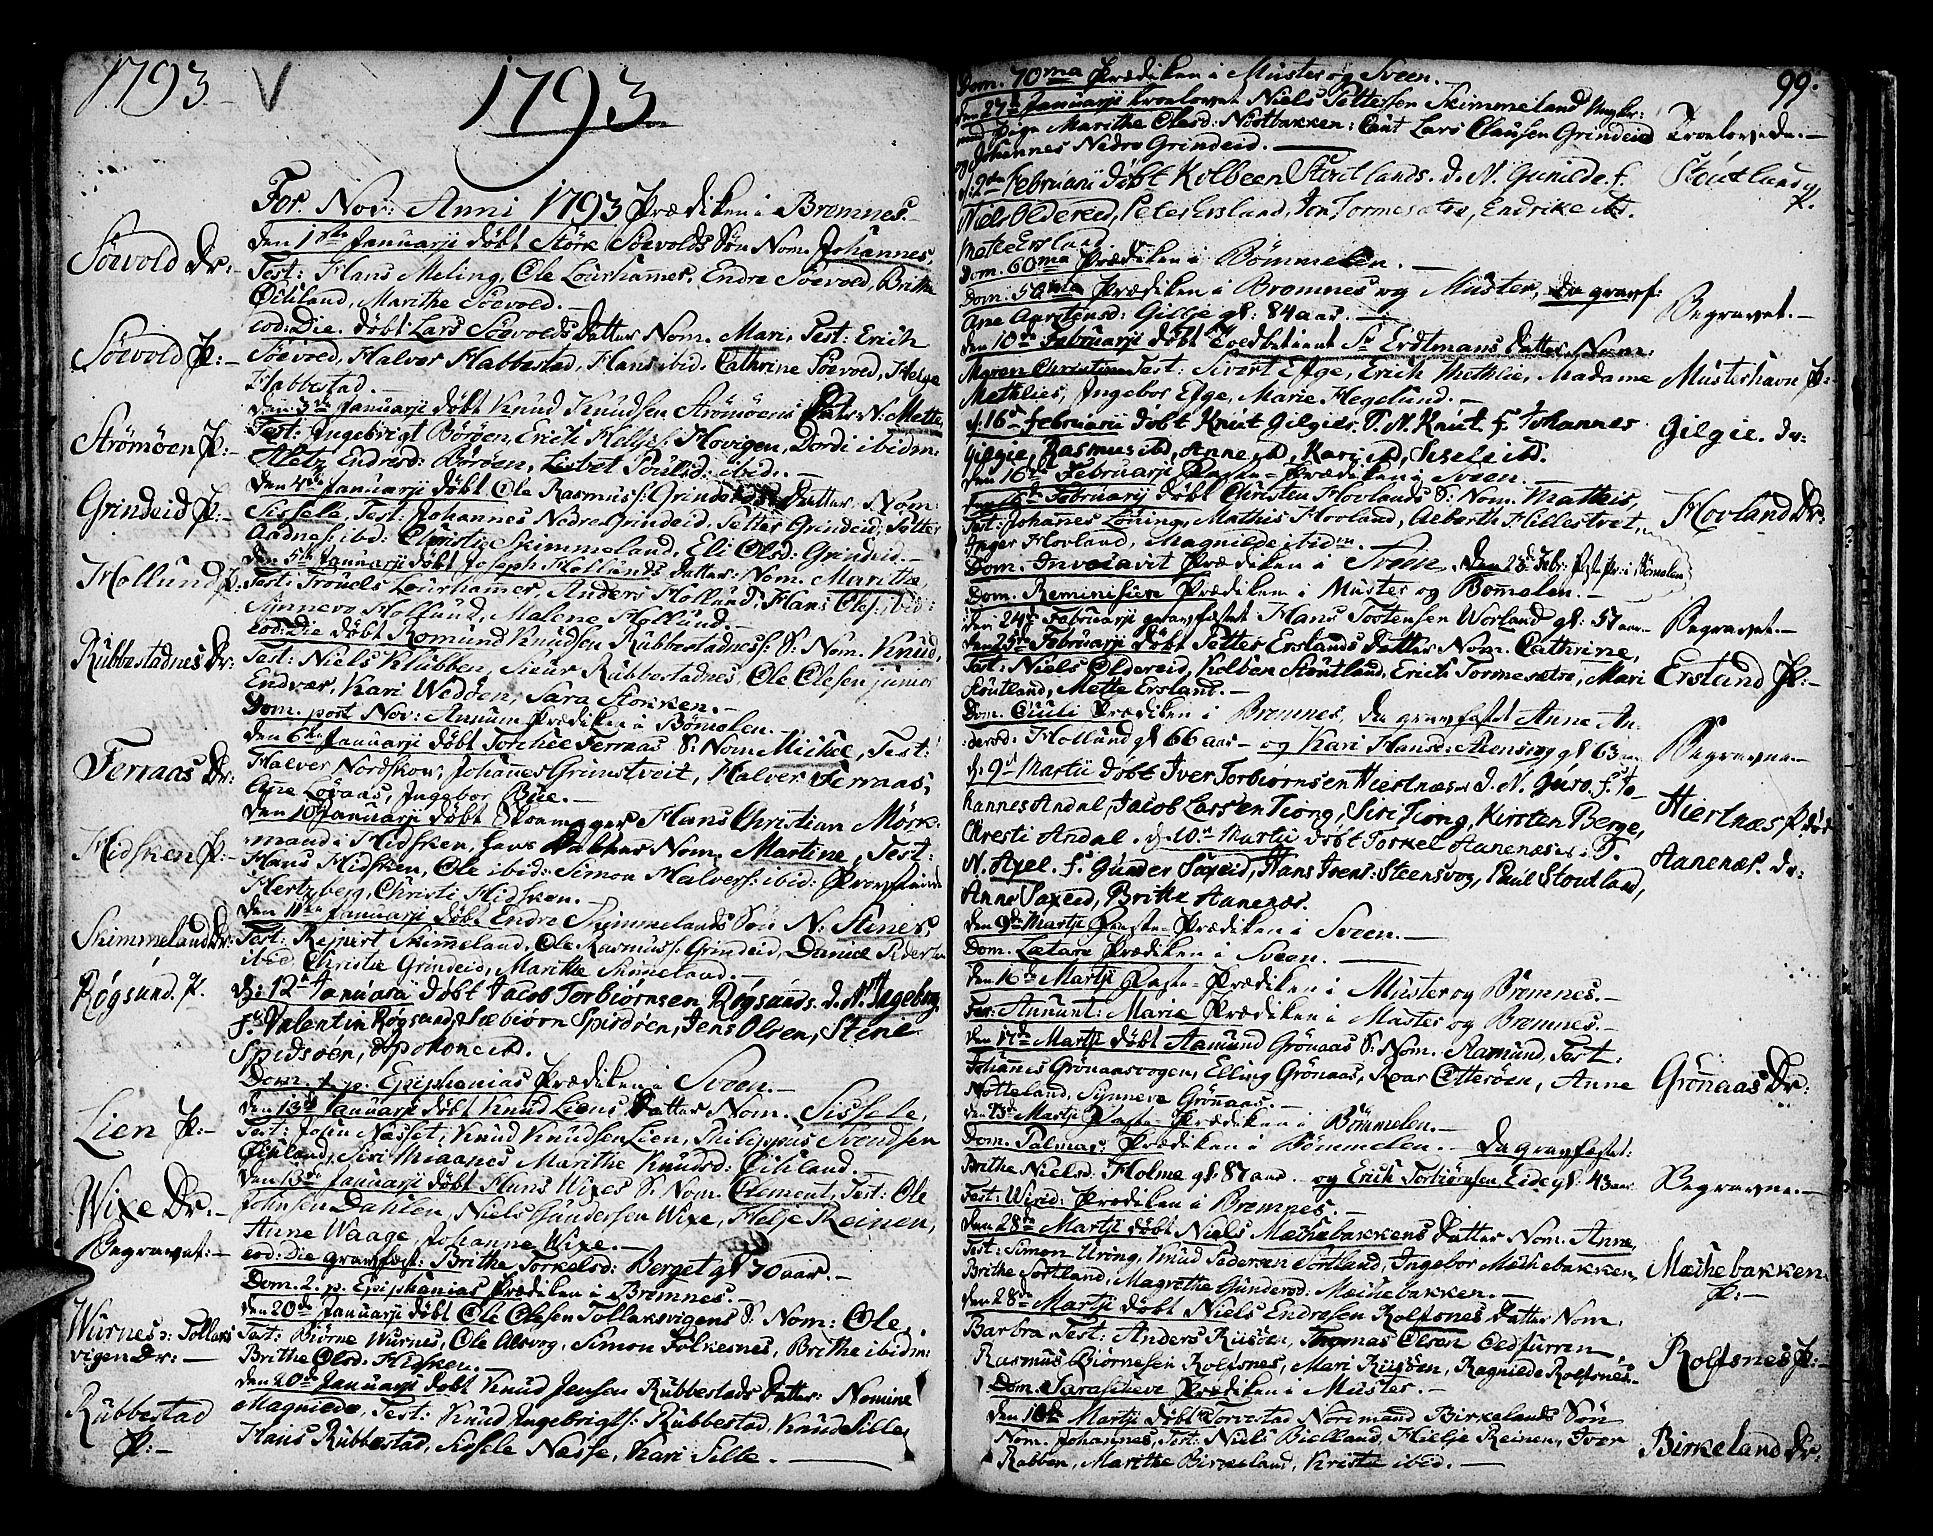 SAB, Finnås sokneprestembete, H/Ha/Haa/Haaa/L0003: Ministerialbok nr. A 3, 1765-1803, s. 99